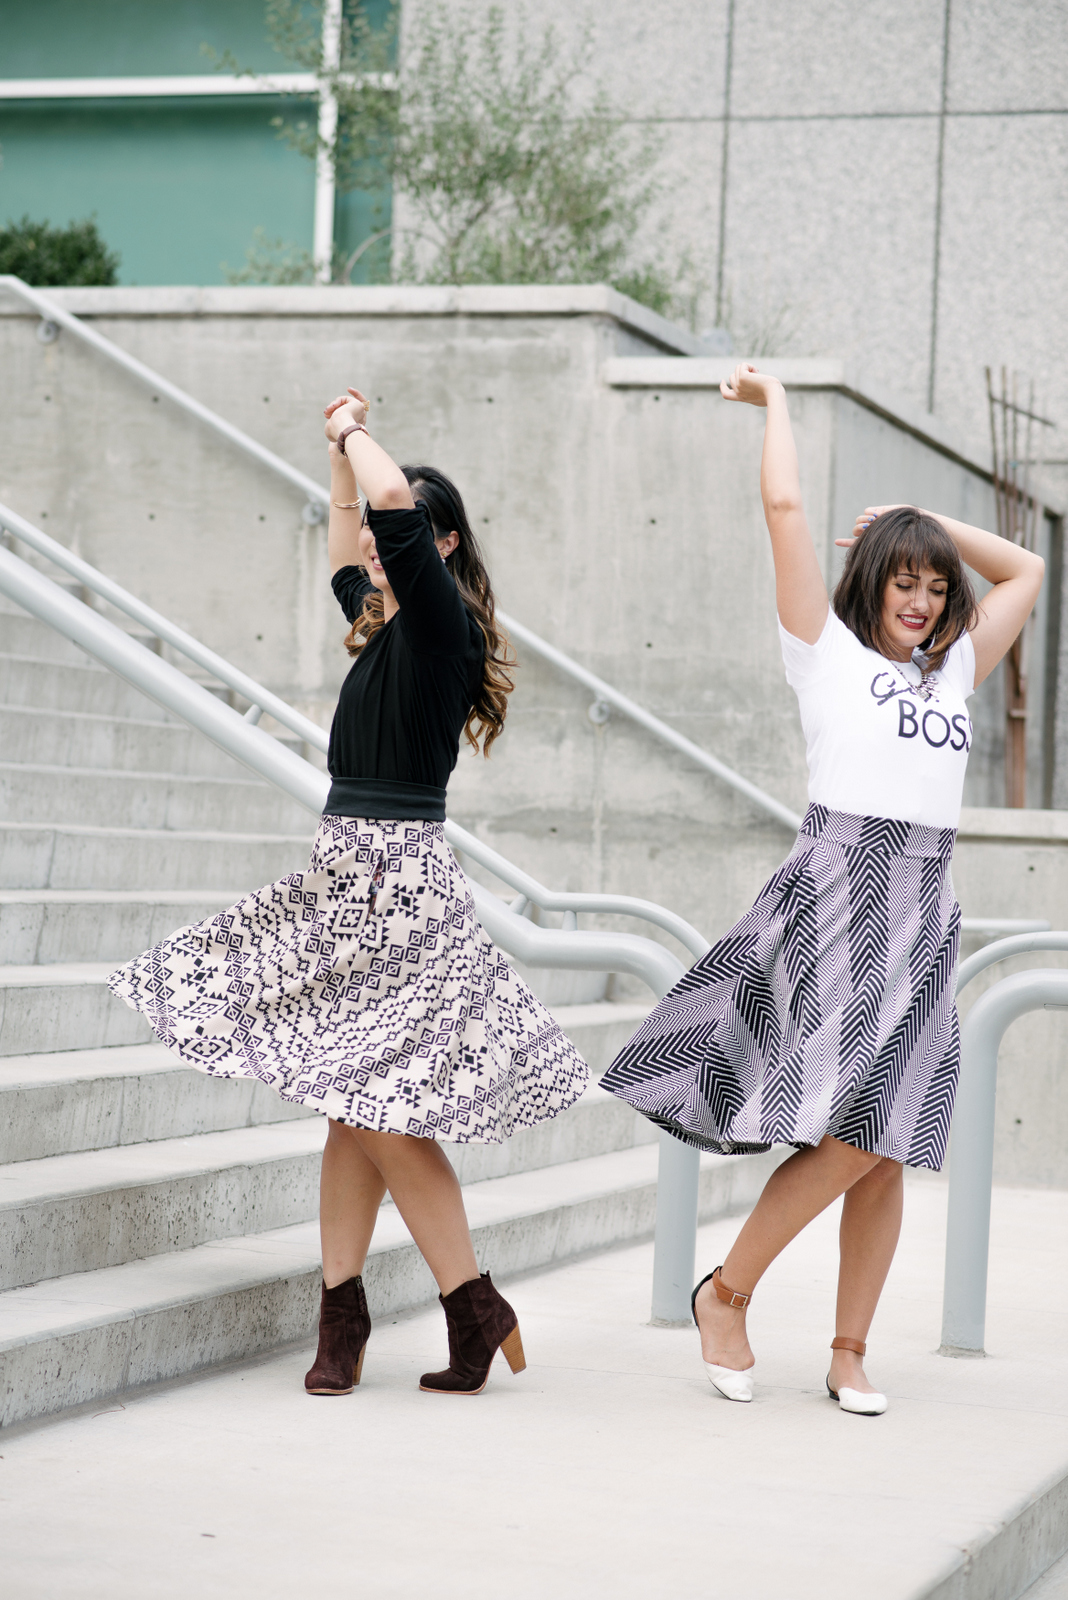 wearing midi skirts for any season